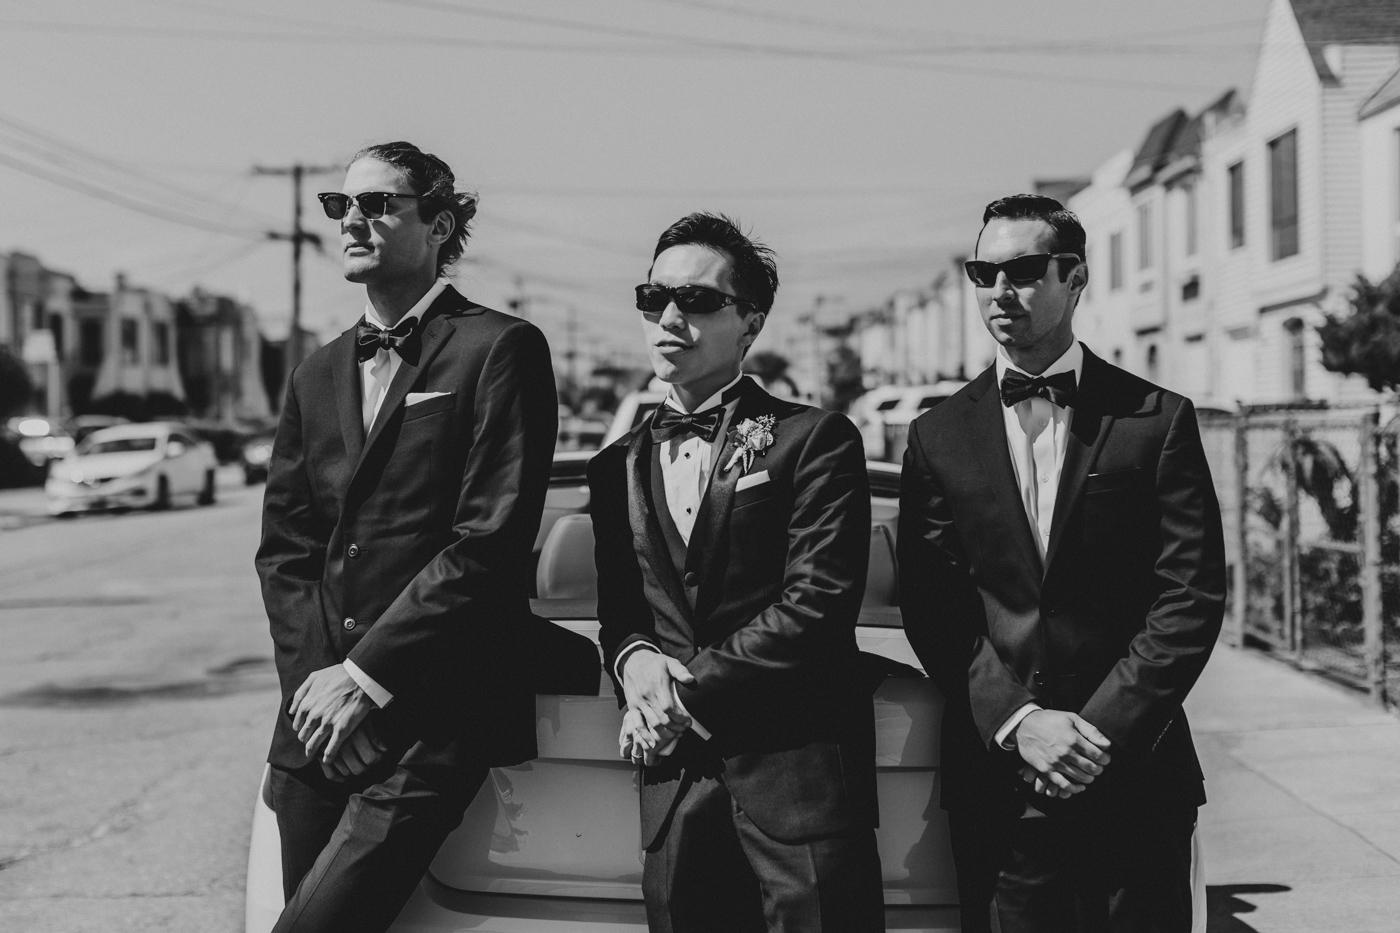 groom-and-groomsmen-leaning-on-car